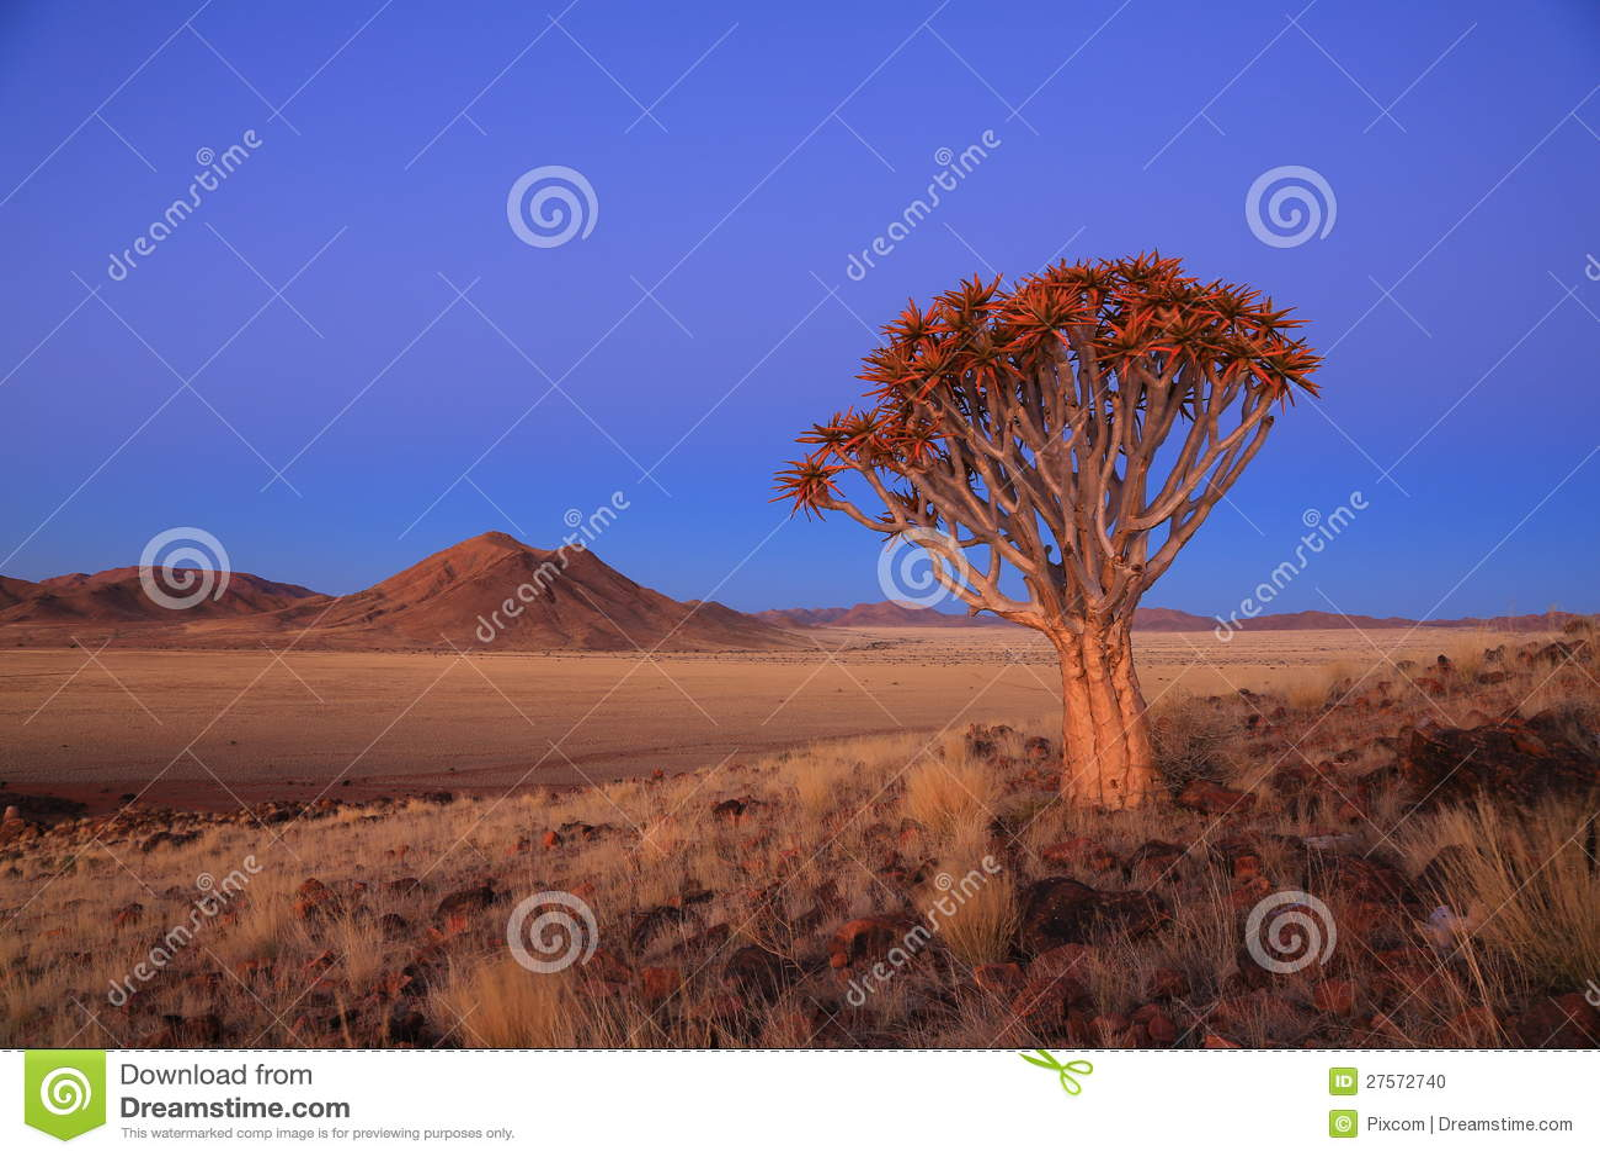 Namibia - Quiver Tree